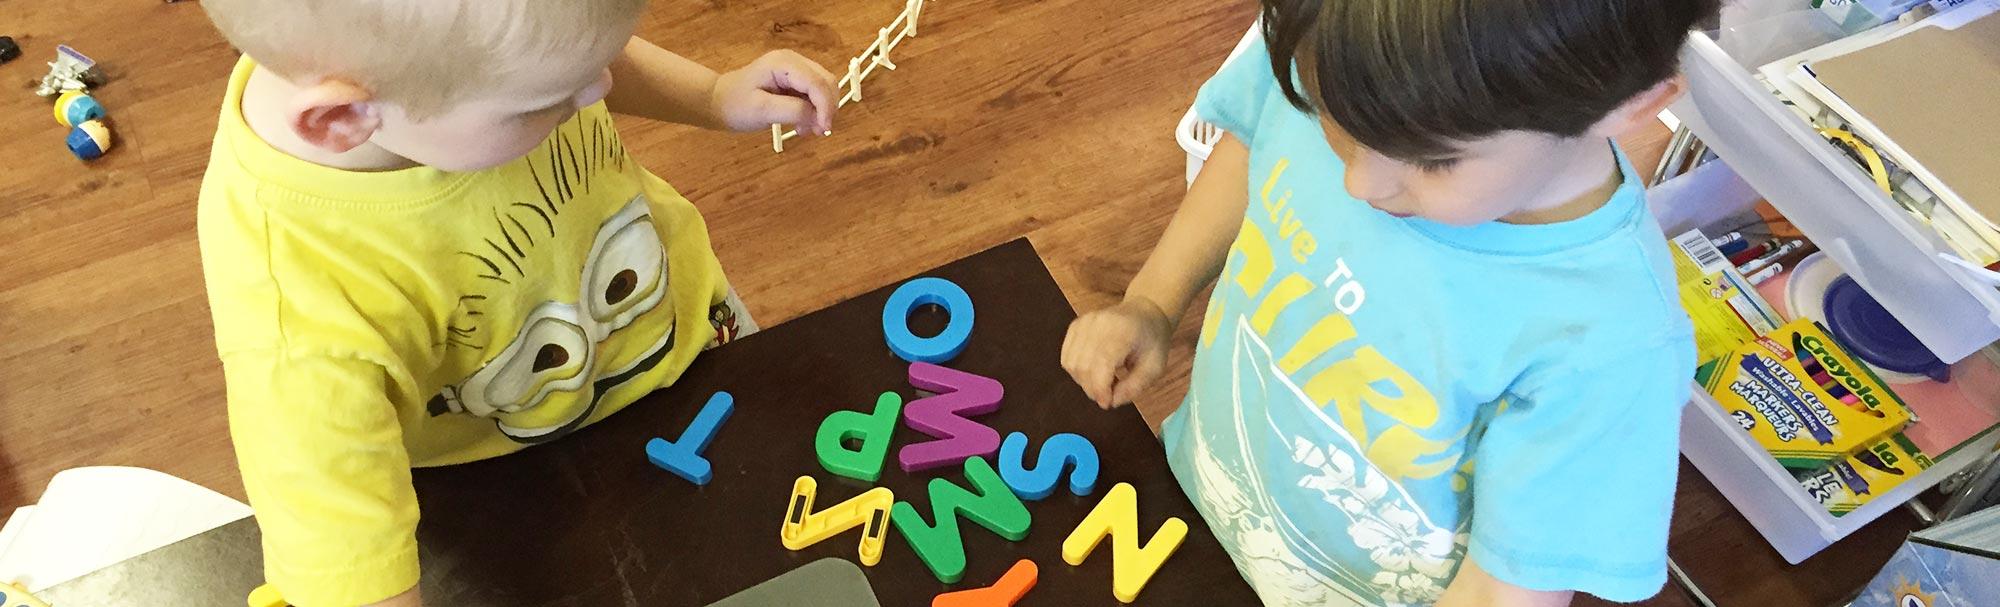 preschool-header-1